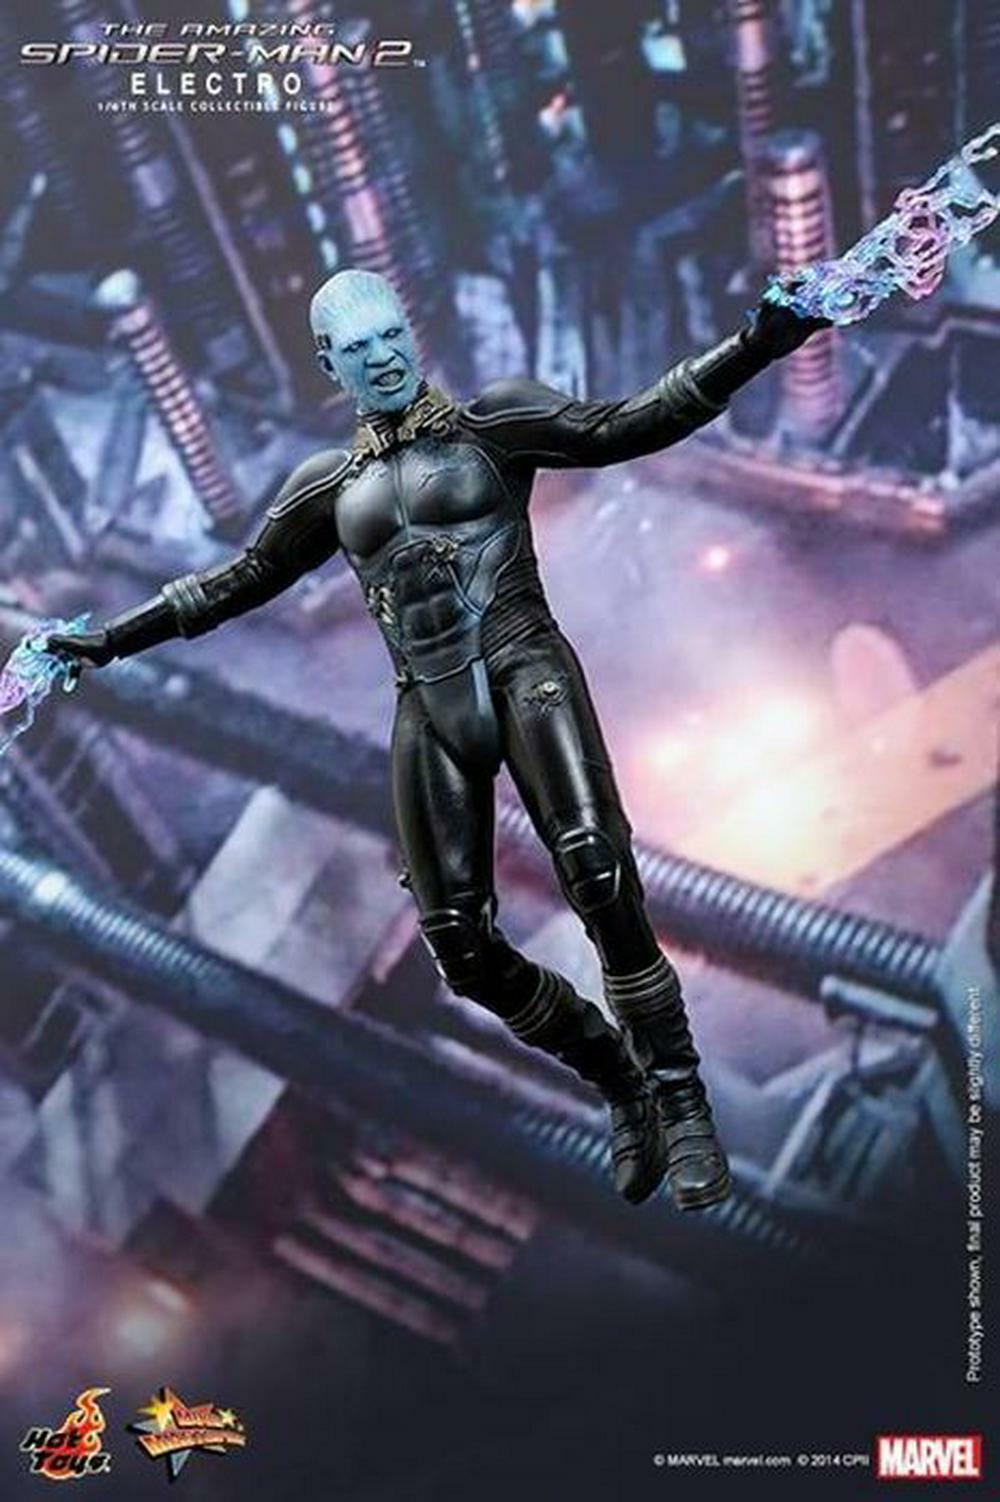 Den Fantastiska Spindelmannen 2 - Electro 1 6 skala Figur -- heta leksaker fri Shipping